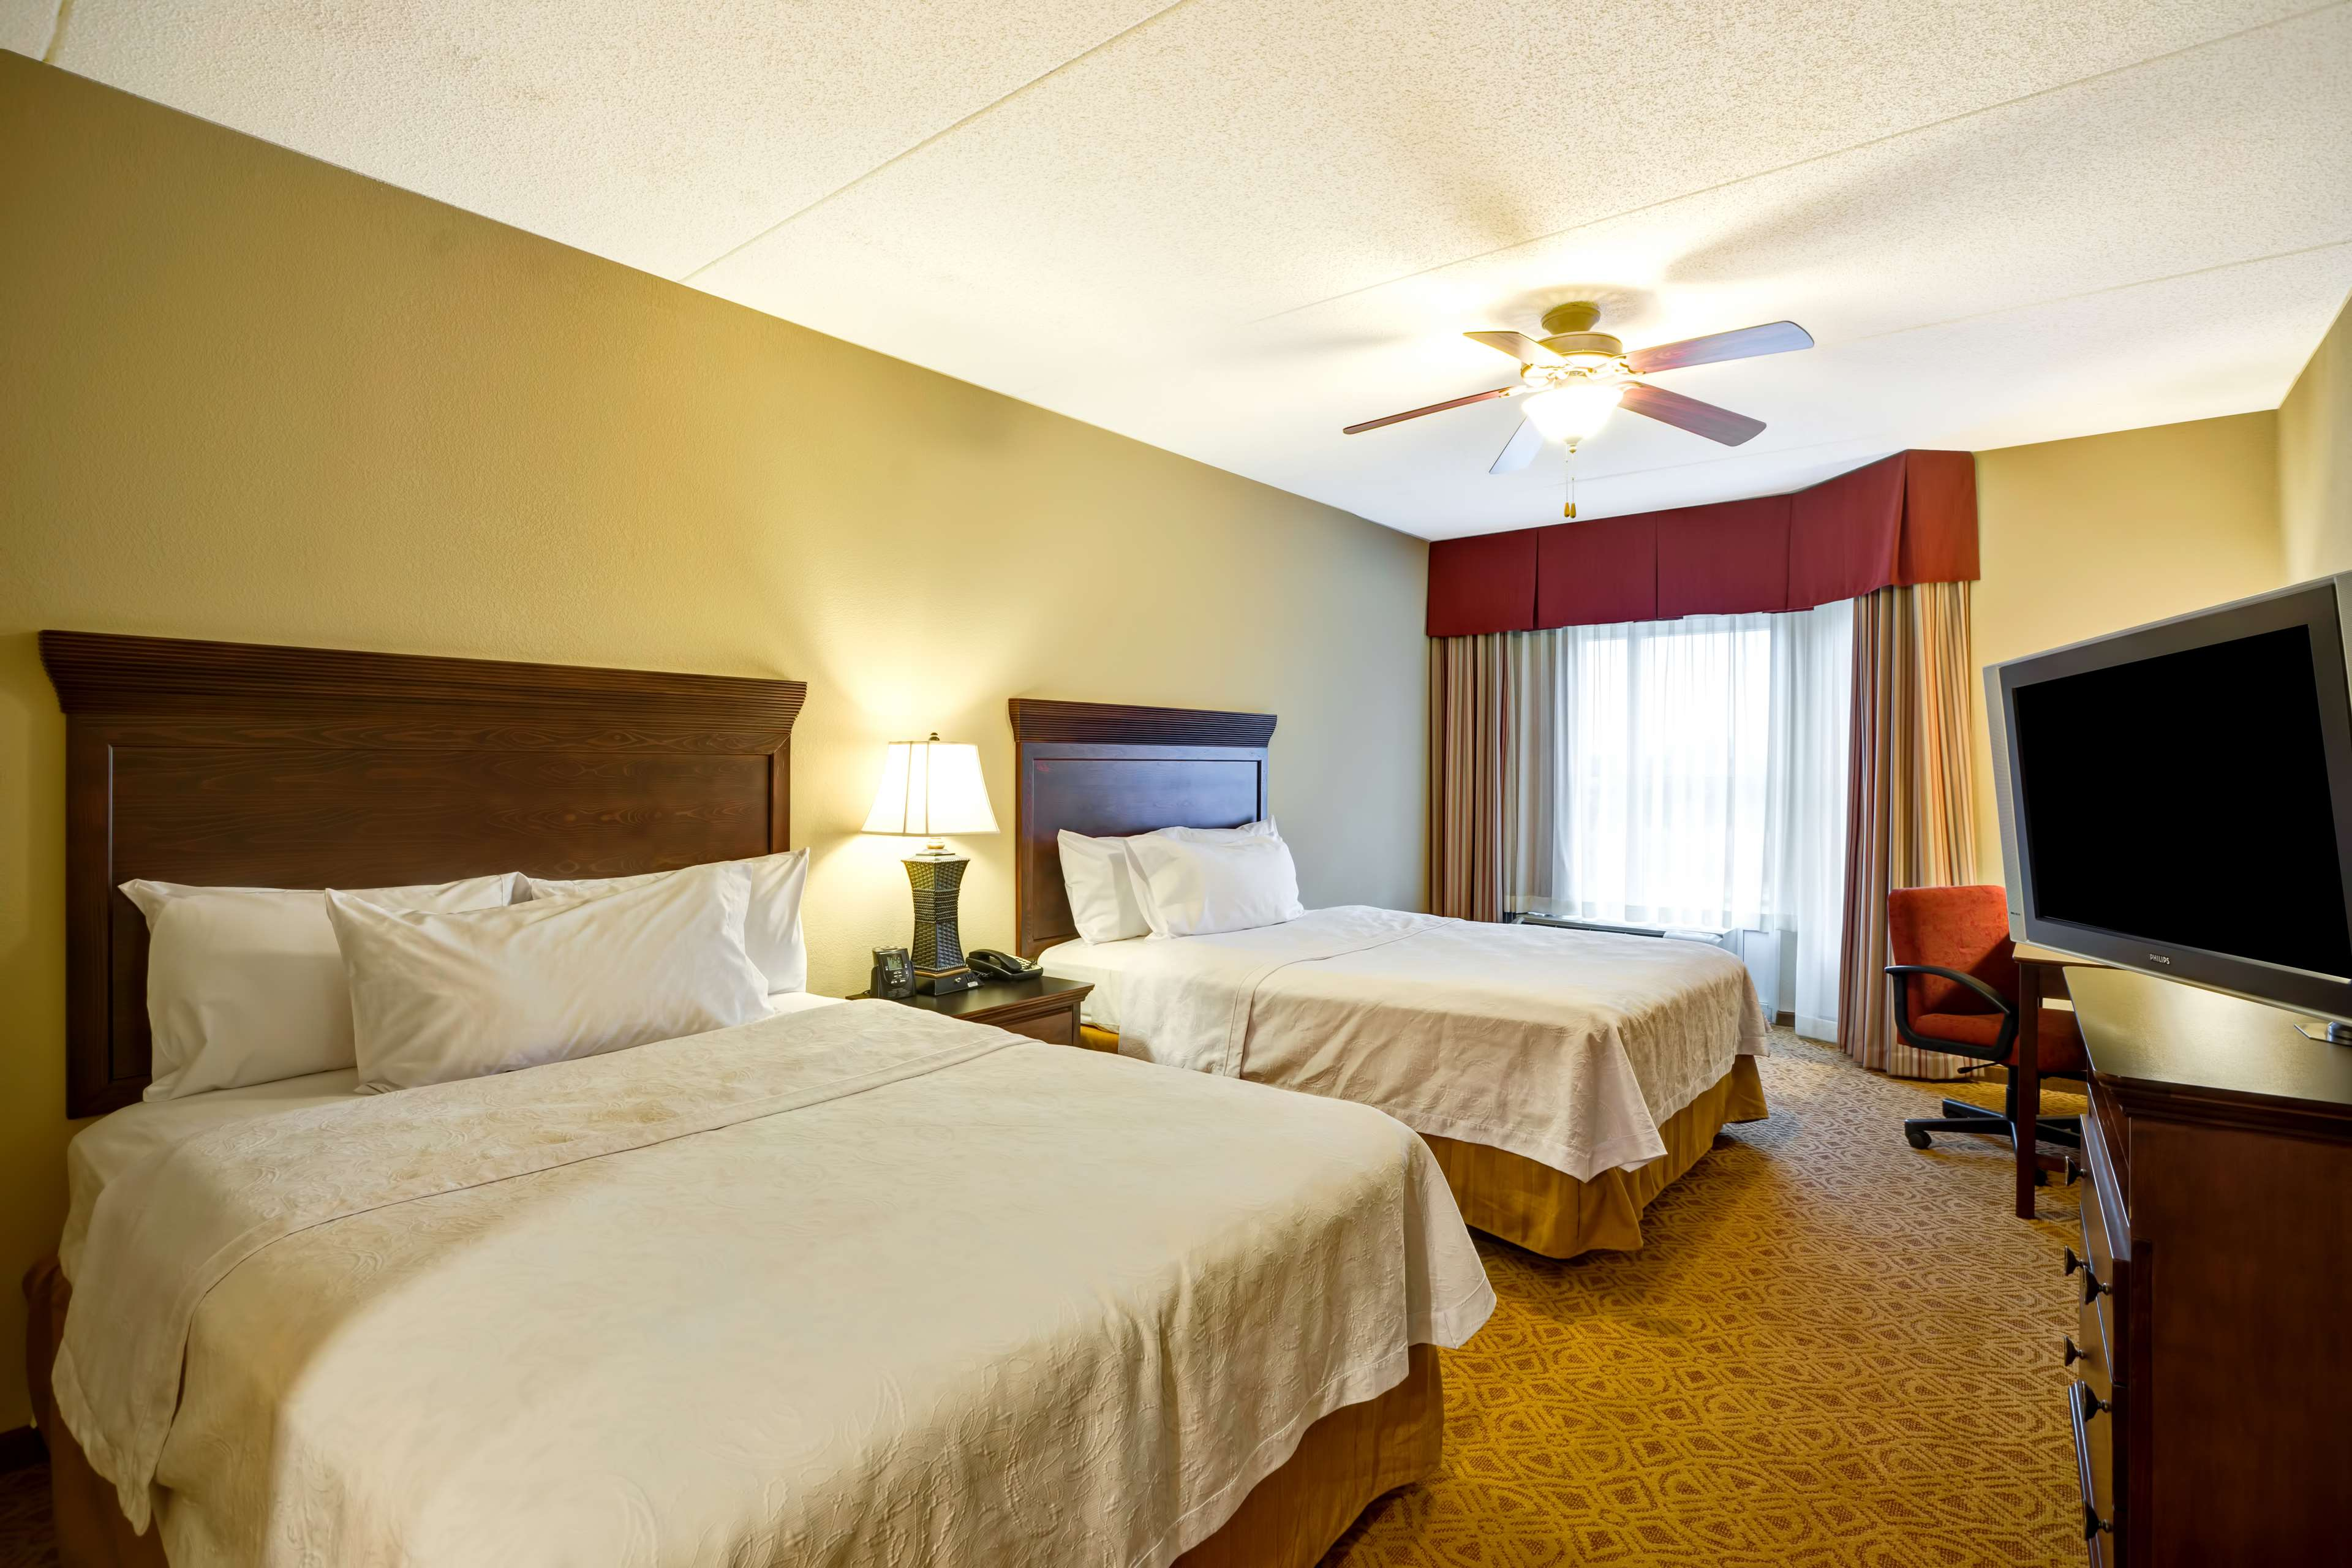 Homewood Suites by Hilton Fredericksburg image 38